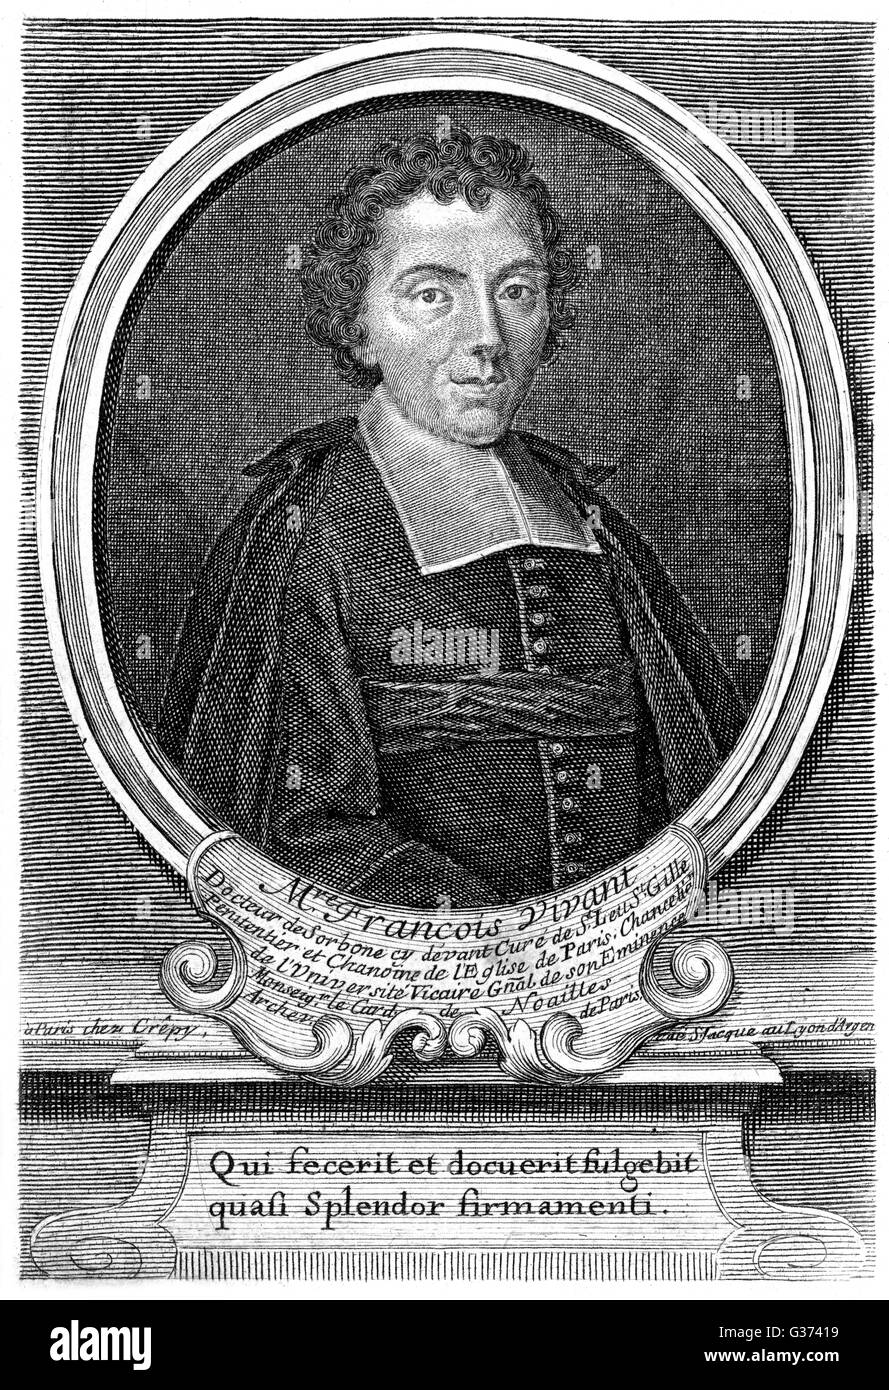 FRANCOIS VIVANT French churchman, theologian  at the Sorbonne, Paris.        Date: 18TH CENTURY - Stock Image